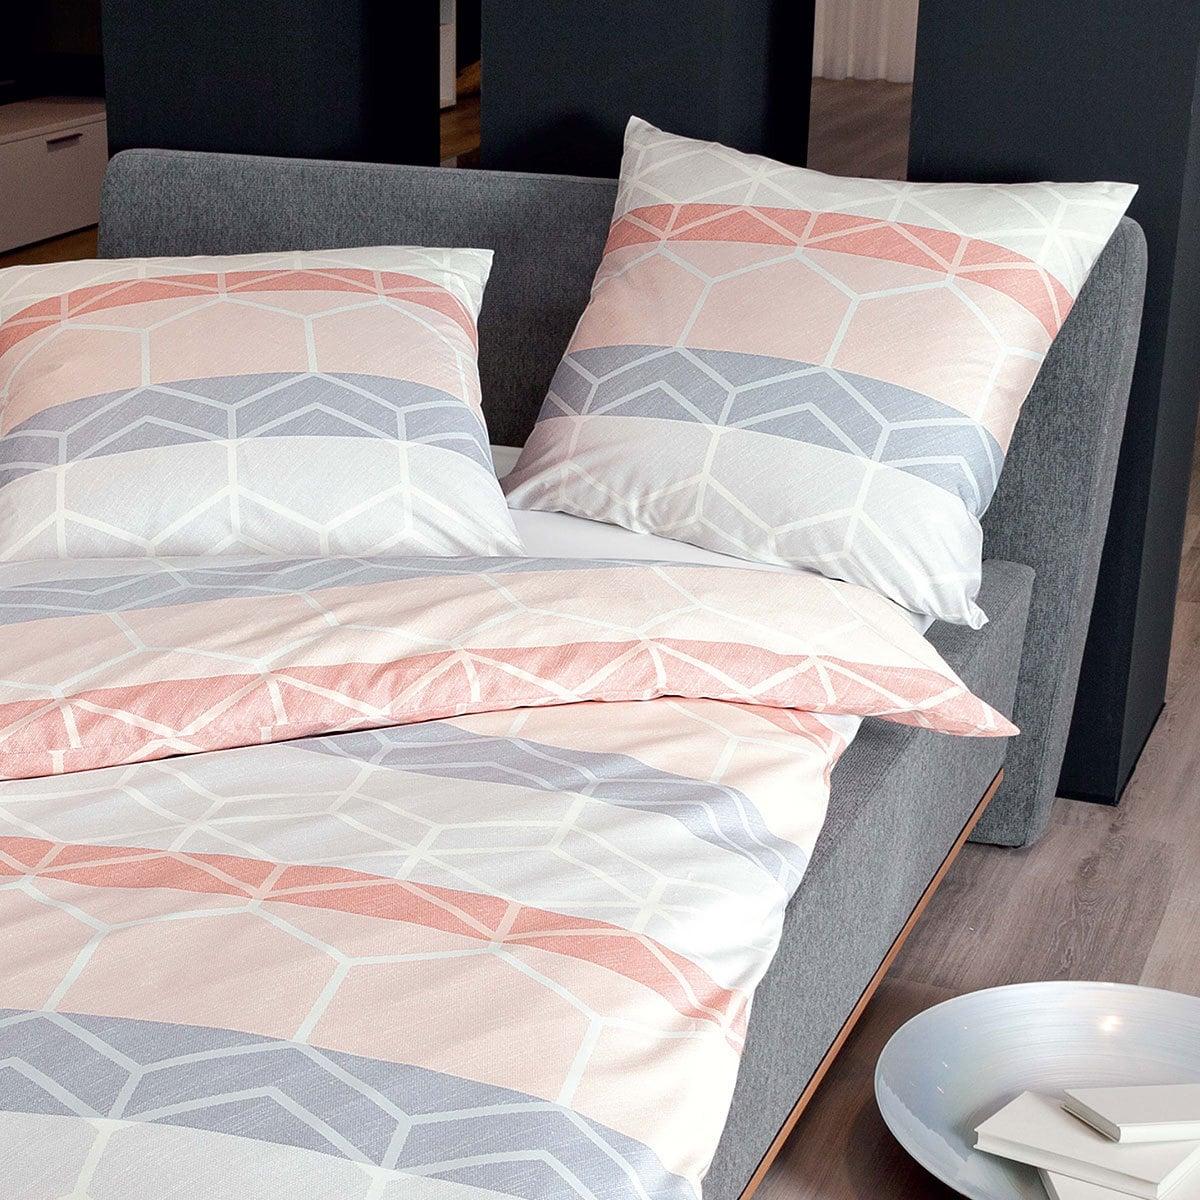 janine mako satin bettw sche moments 98017 01 g nstig online kaufen bei bettwaren shop. Black Bedroom Furniture Sets. Home Design Ideas